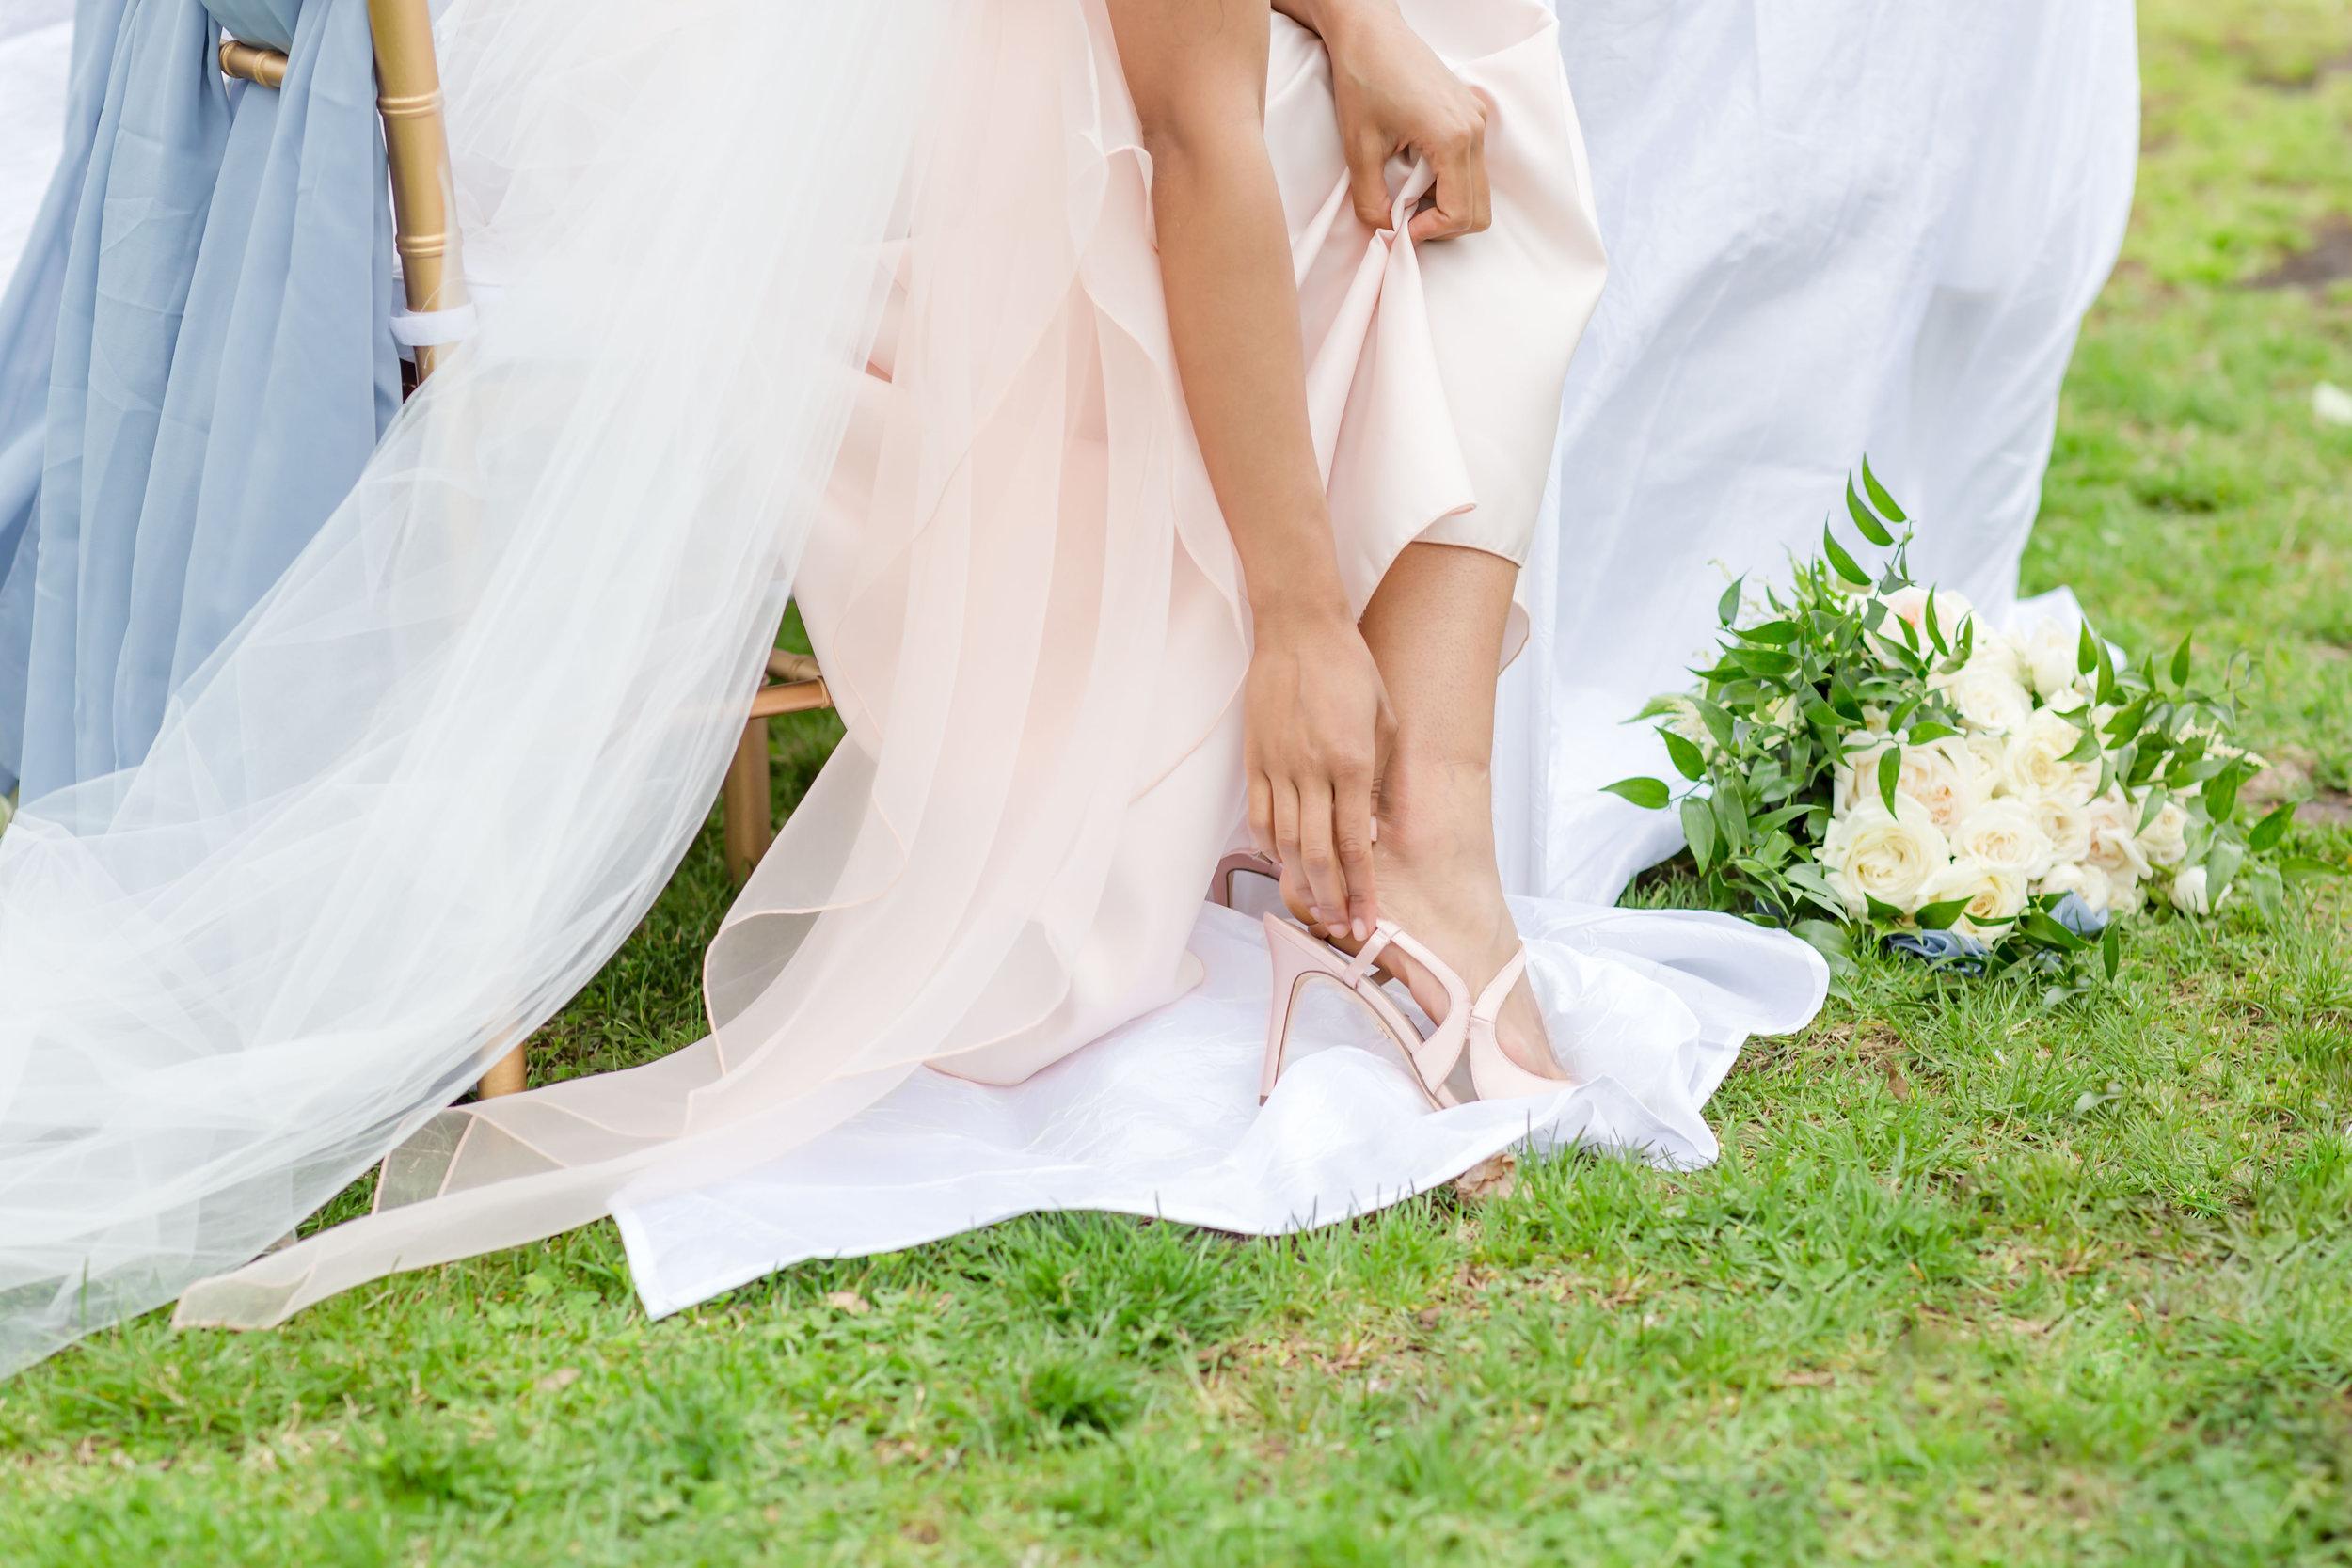 ScarlettExpressions-StyledShoot-Bridal-116.jpg